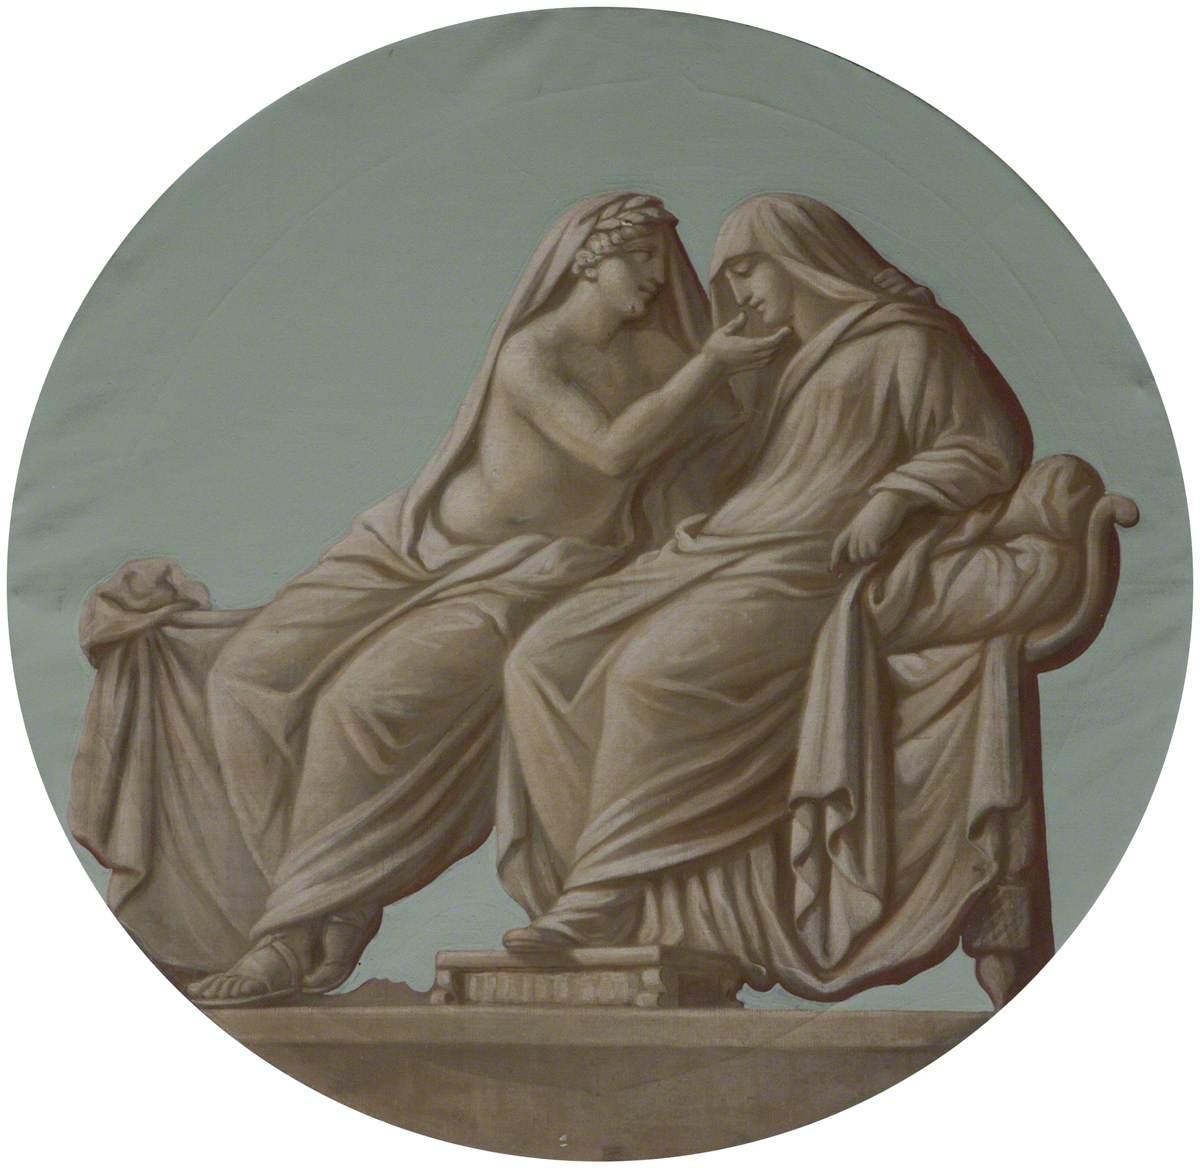 A (Grecian/Roman) Wedding: Retiring to Rest (Alcestis with Apollo)